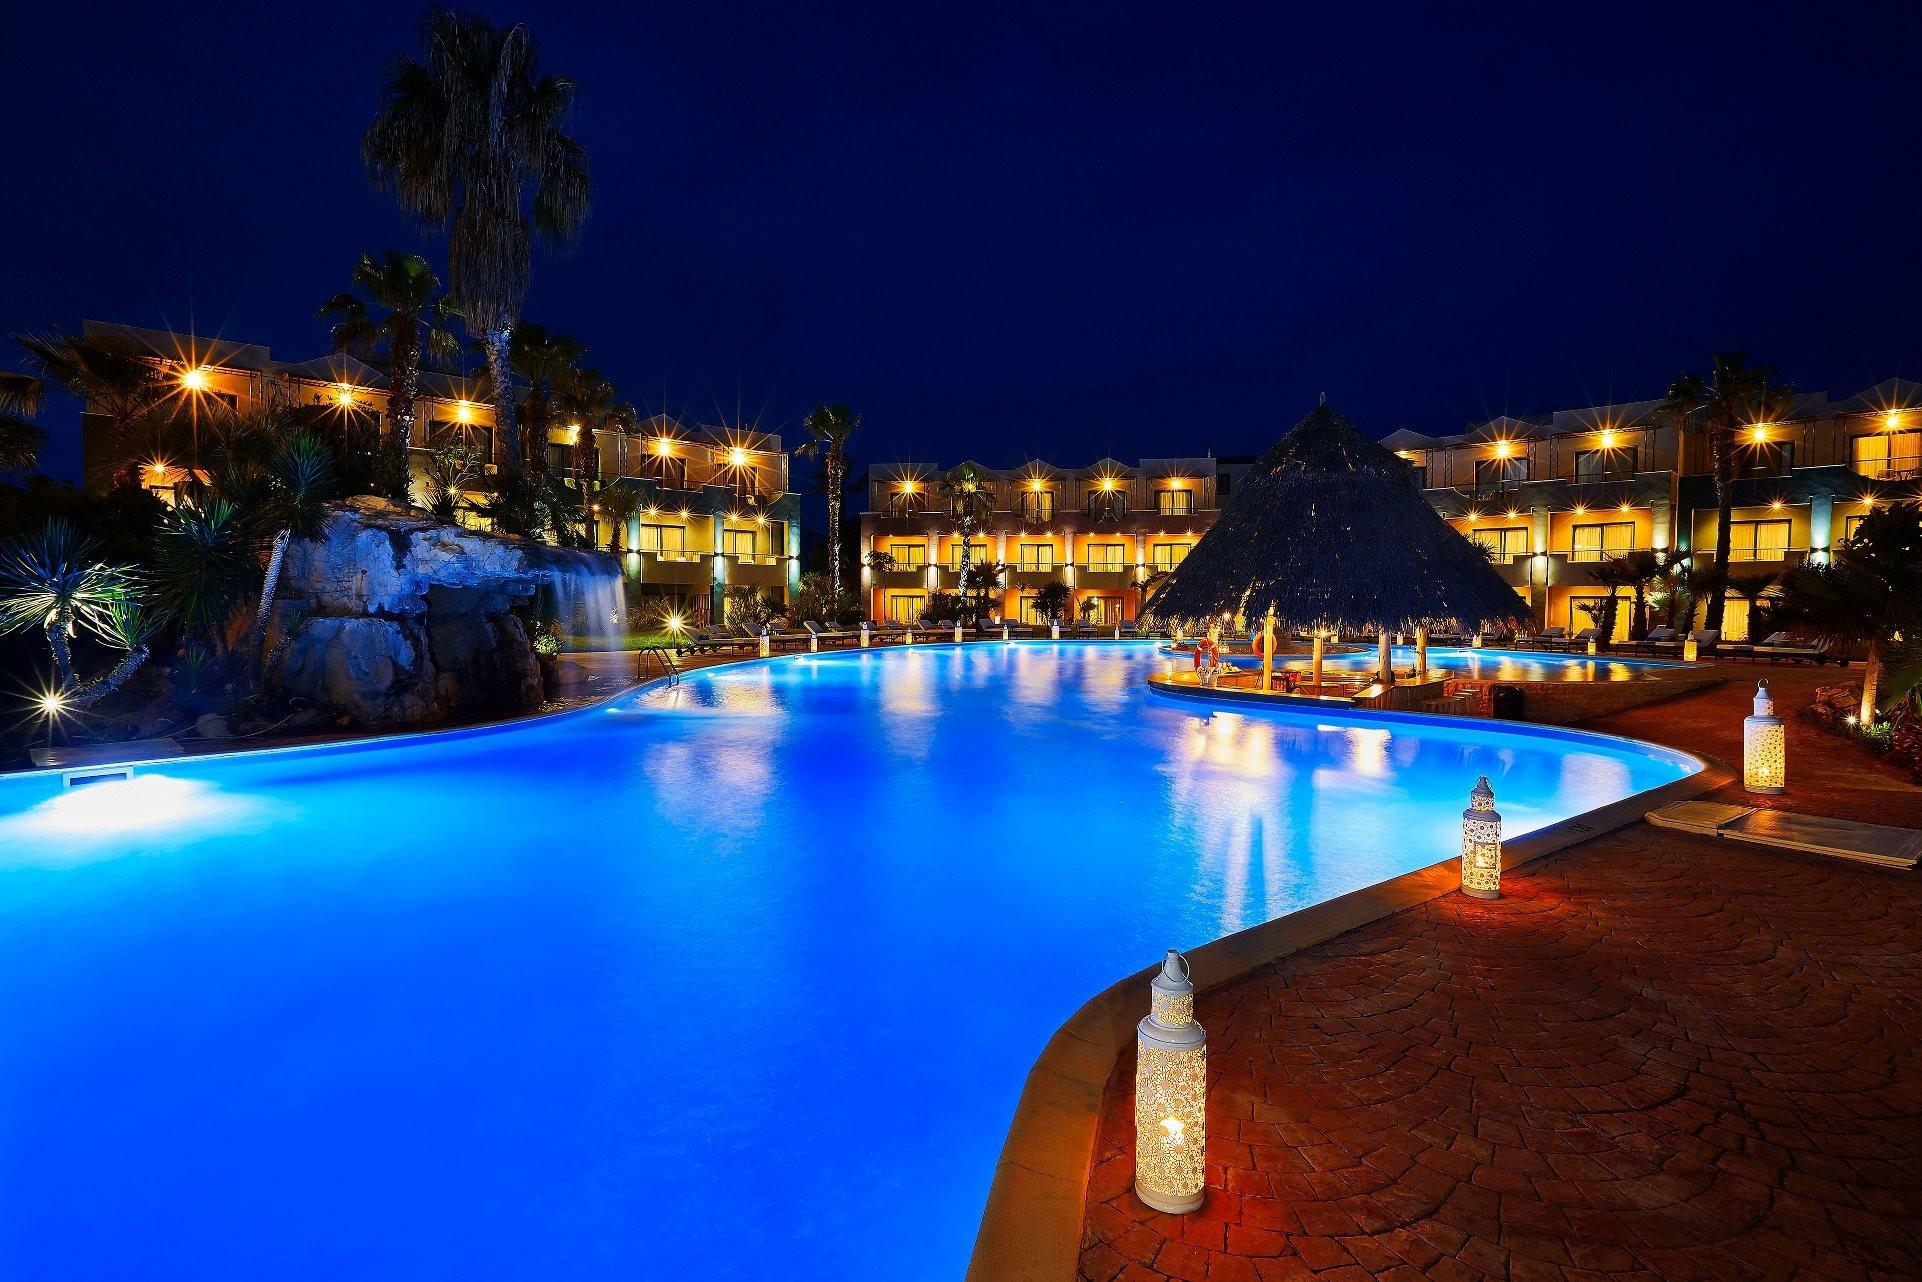 Ilio Mare Hotels & Resorts - басейн през нощта